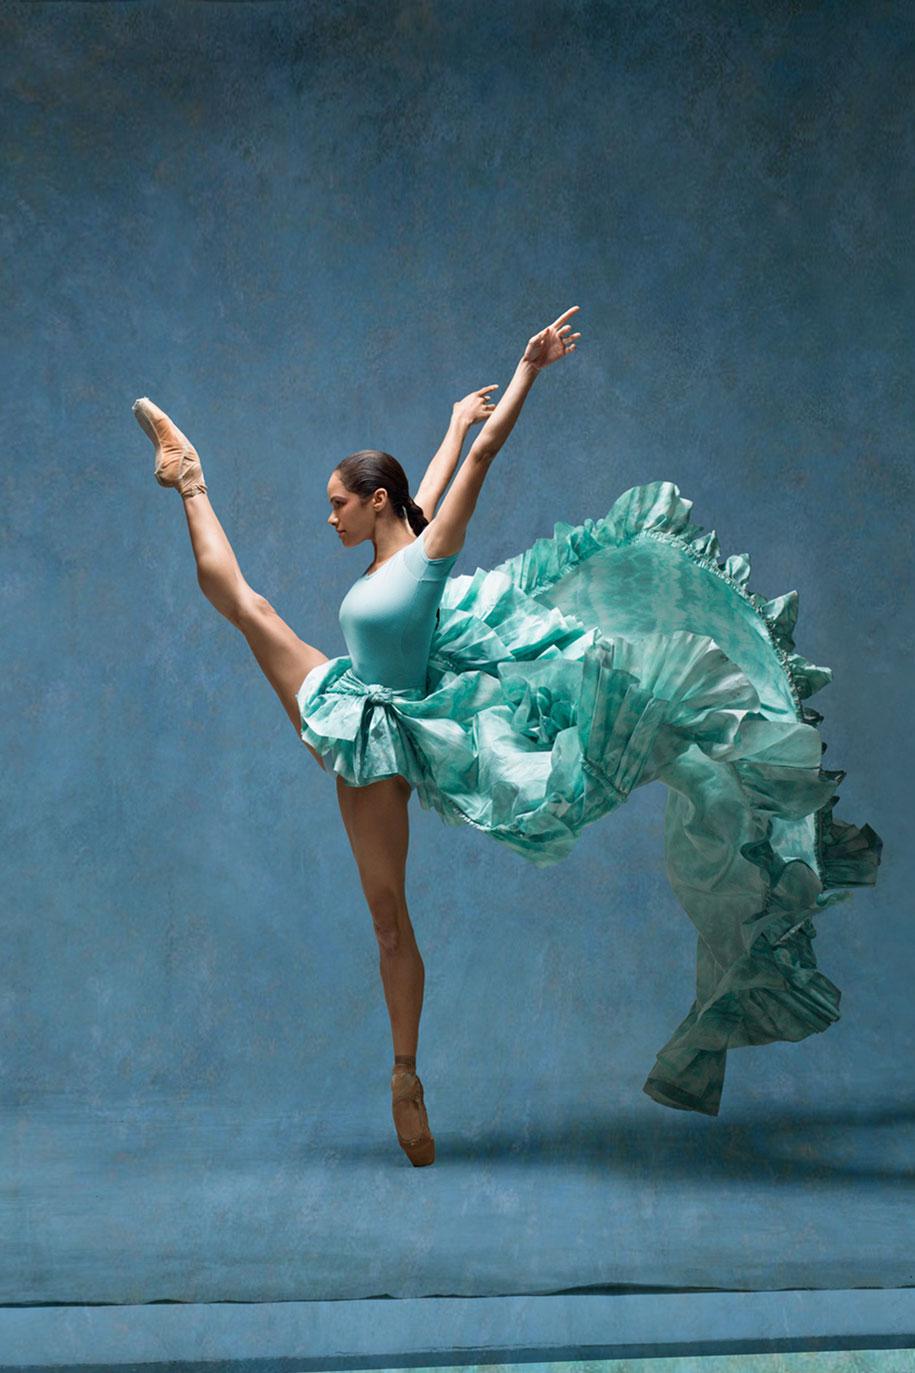 dipinti-danza-edgar-degas-fotografia-misty-copeland-7